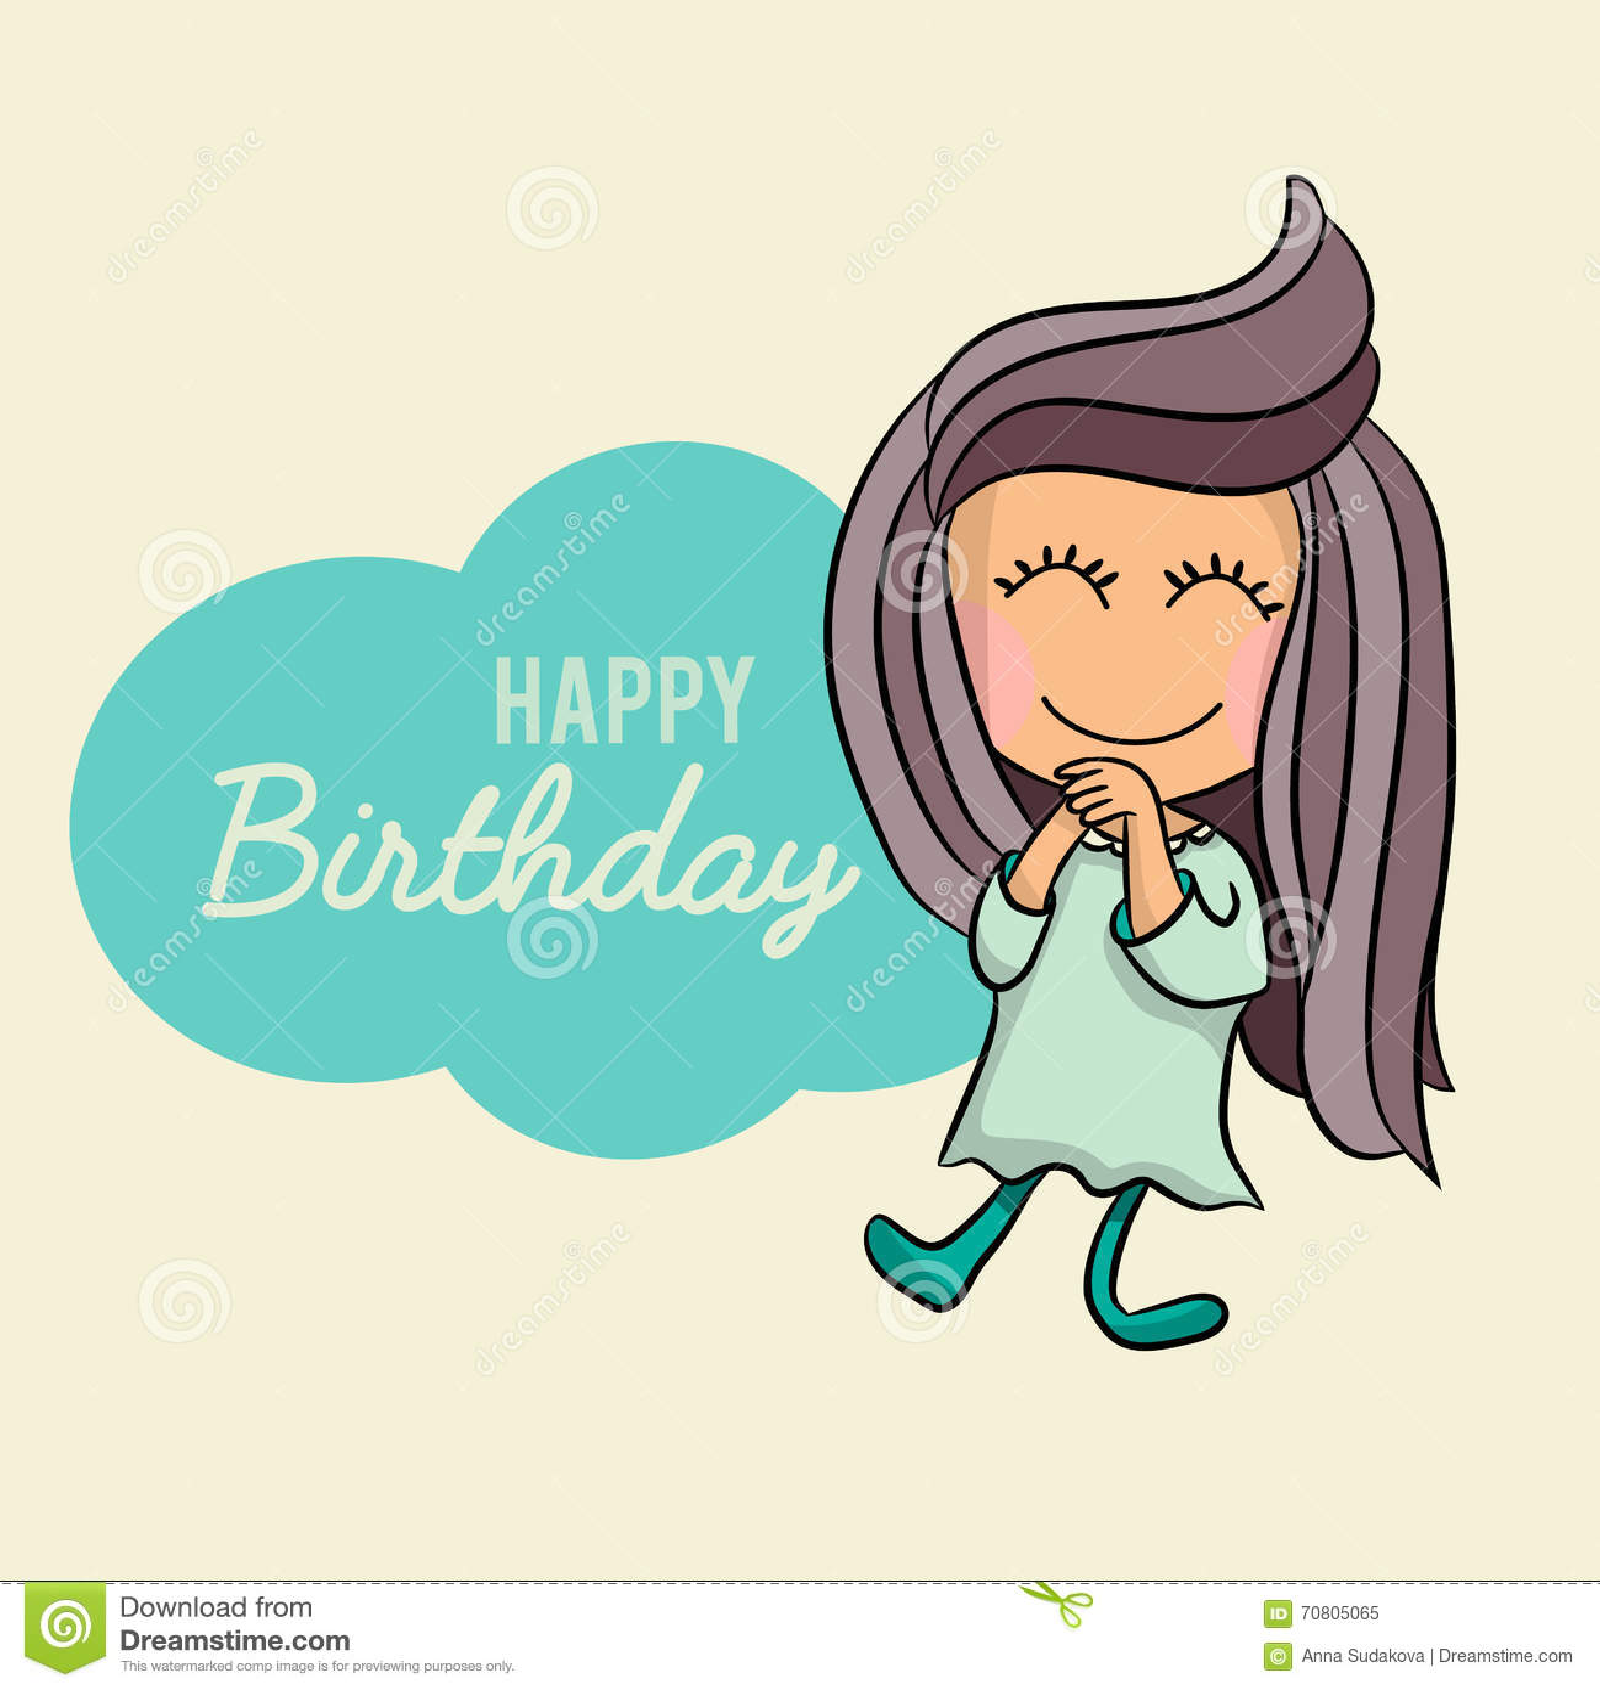 Cute Happy Birthday Cartoon Greetings Card, Postcard